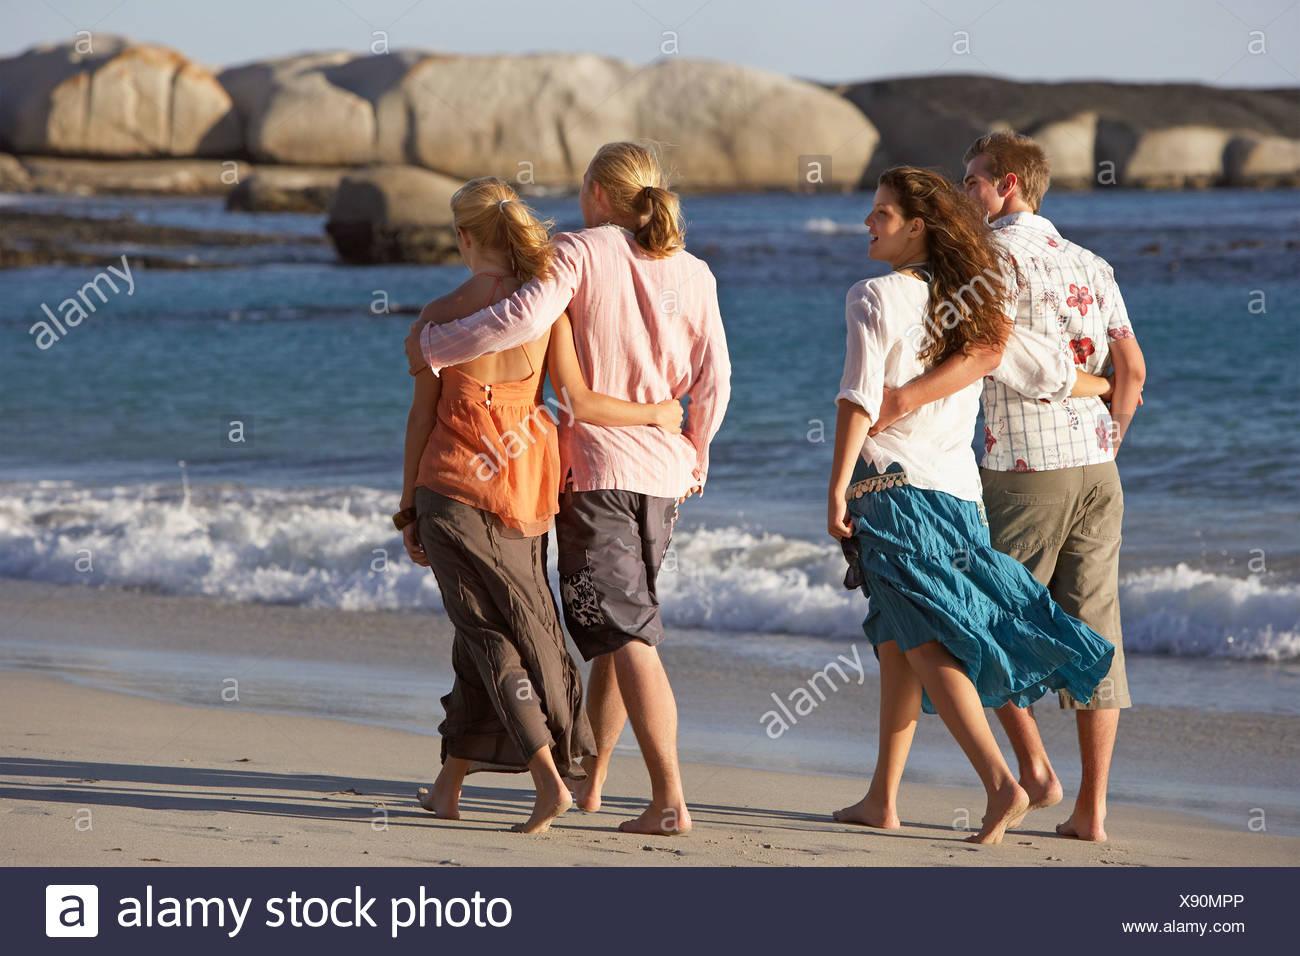 Two teenage couples 17 19 walking on beach near water s edge arm around waist rear view - Stock Image